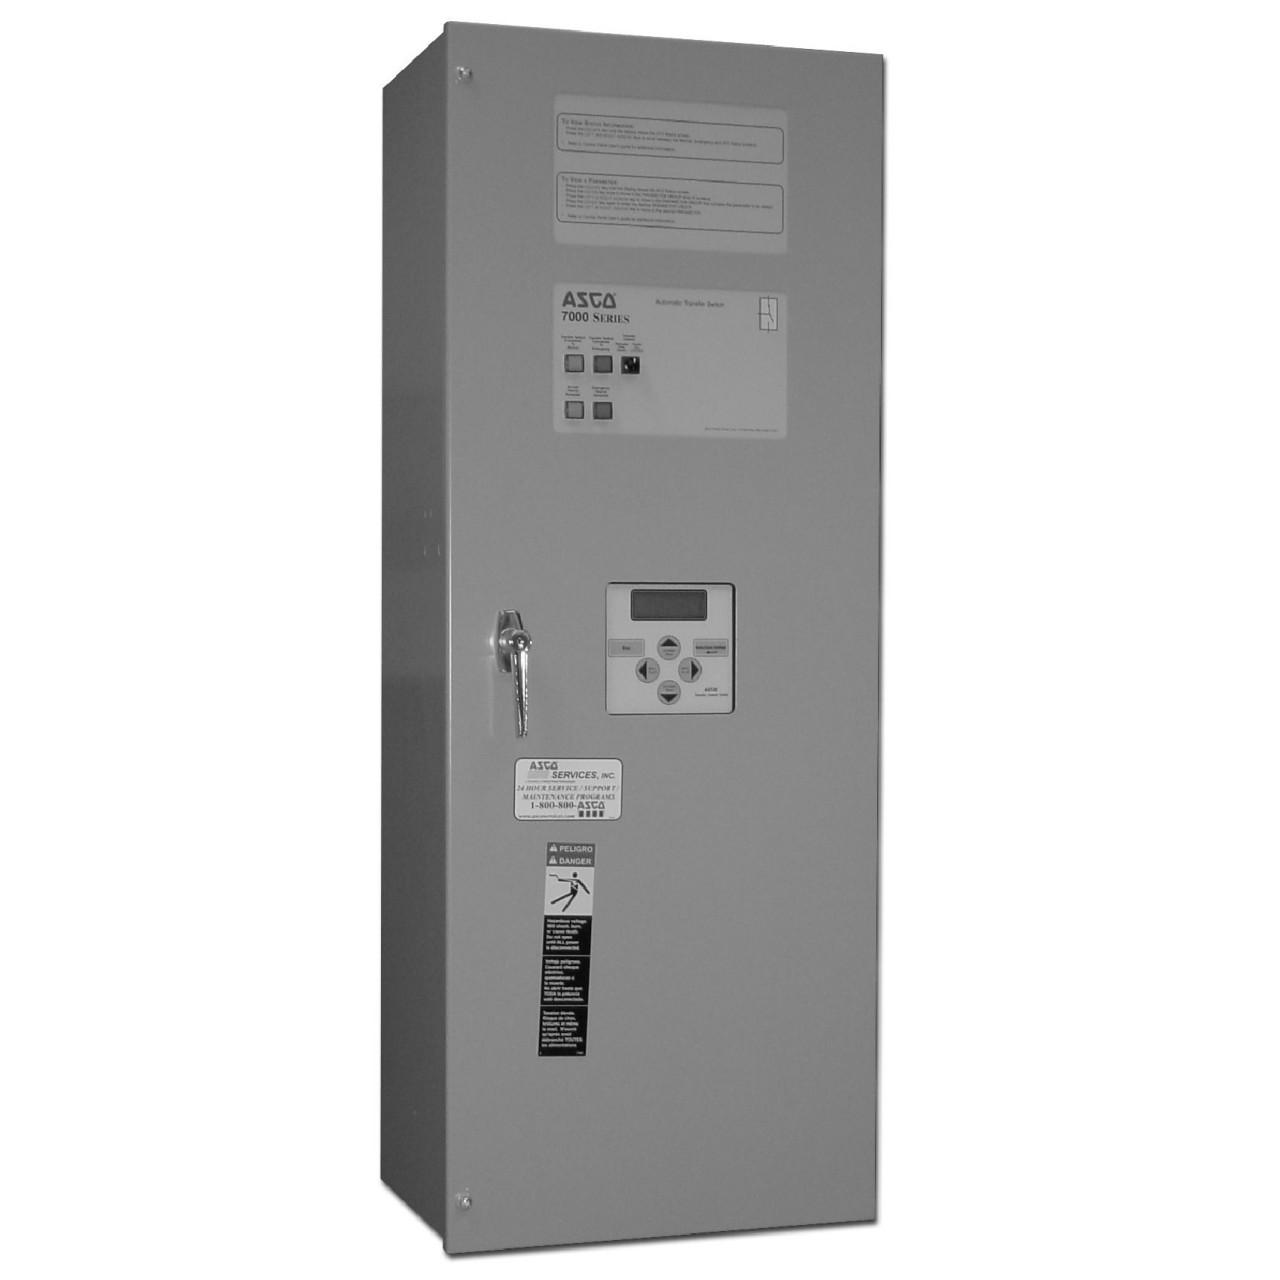 Asco 7000 Manual Transfer Switch (1Ph, 150A)